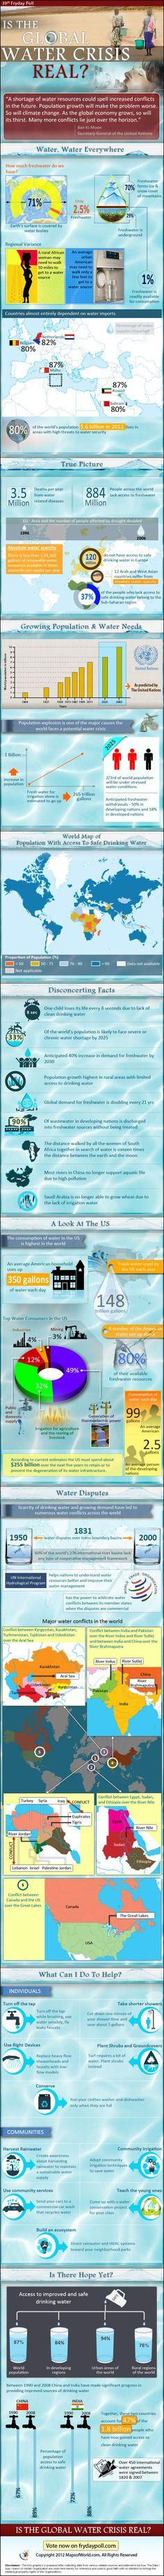 Global Water Crisis - iNFOGRAPHiCs MANiA